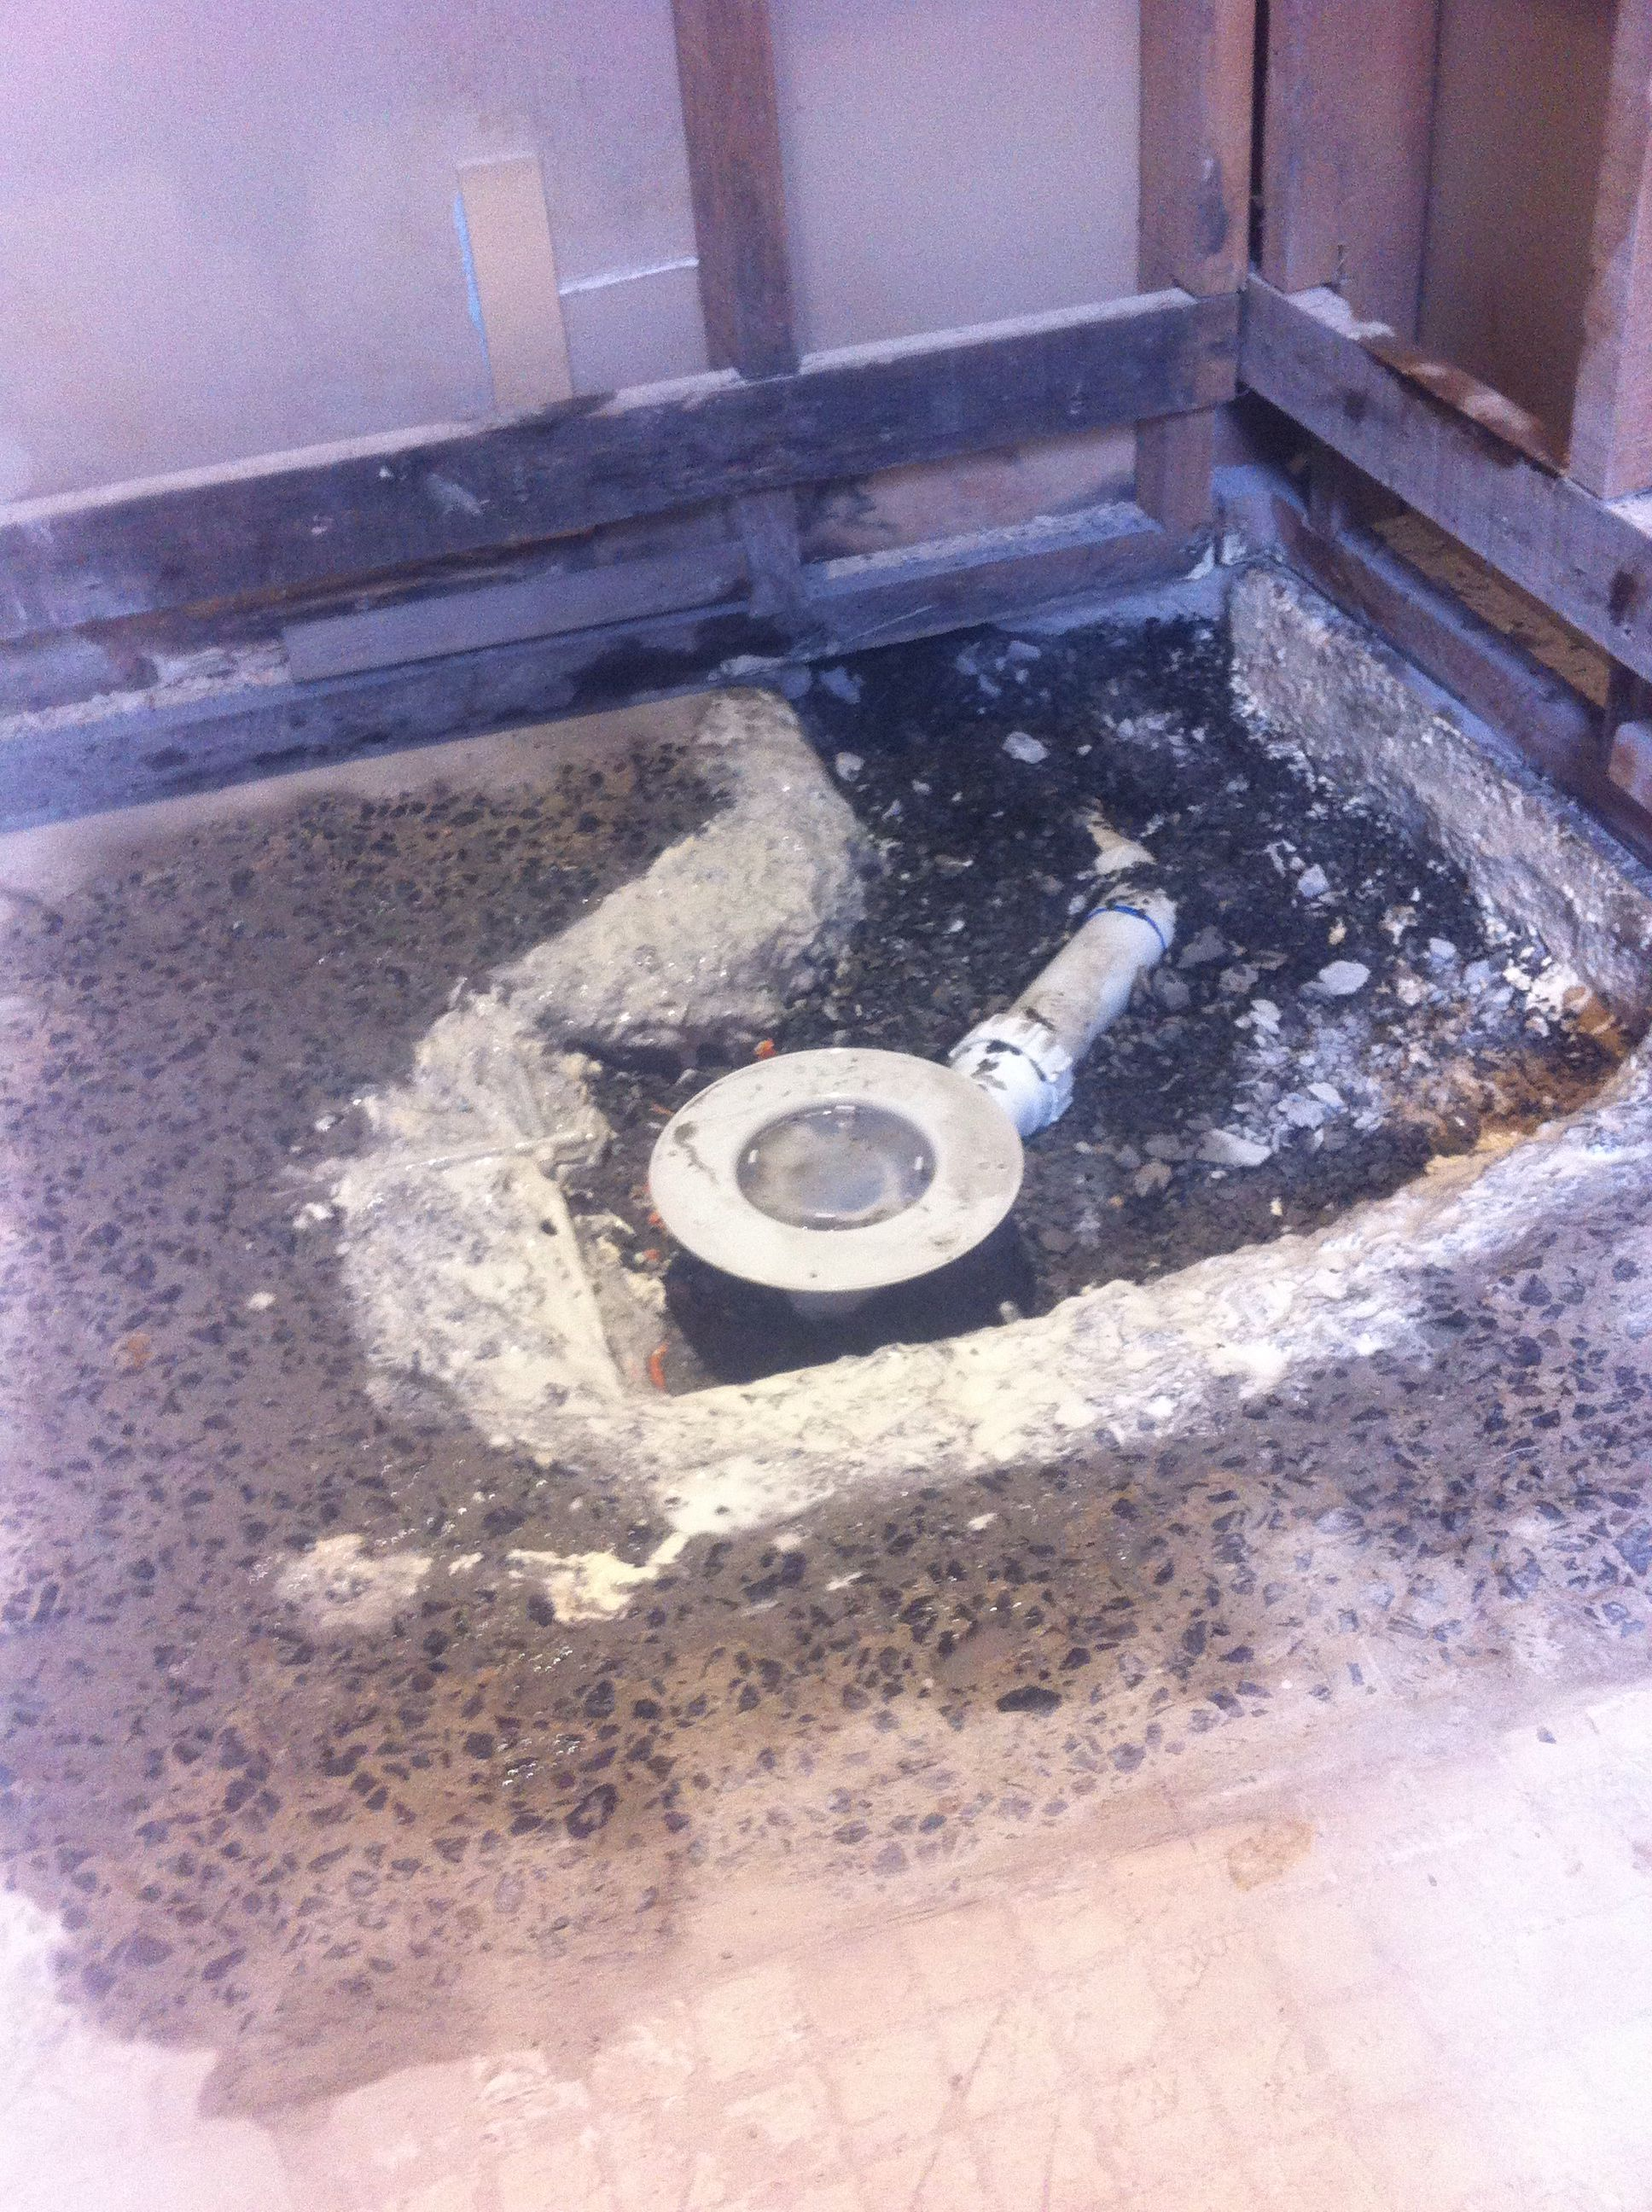 Preparing For A Stepless Shower Base In An Existing Concrete Slab Shower Remodel Shower Base Outdoor Decor